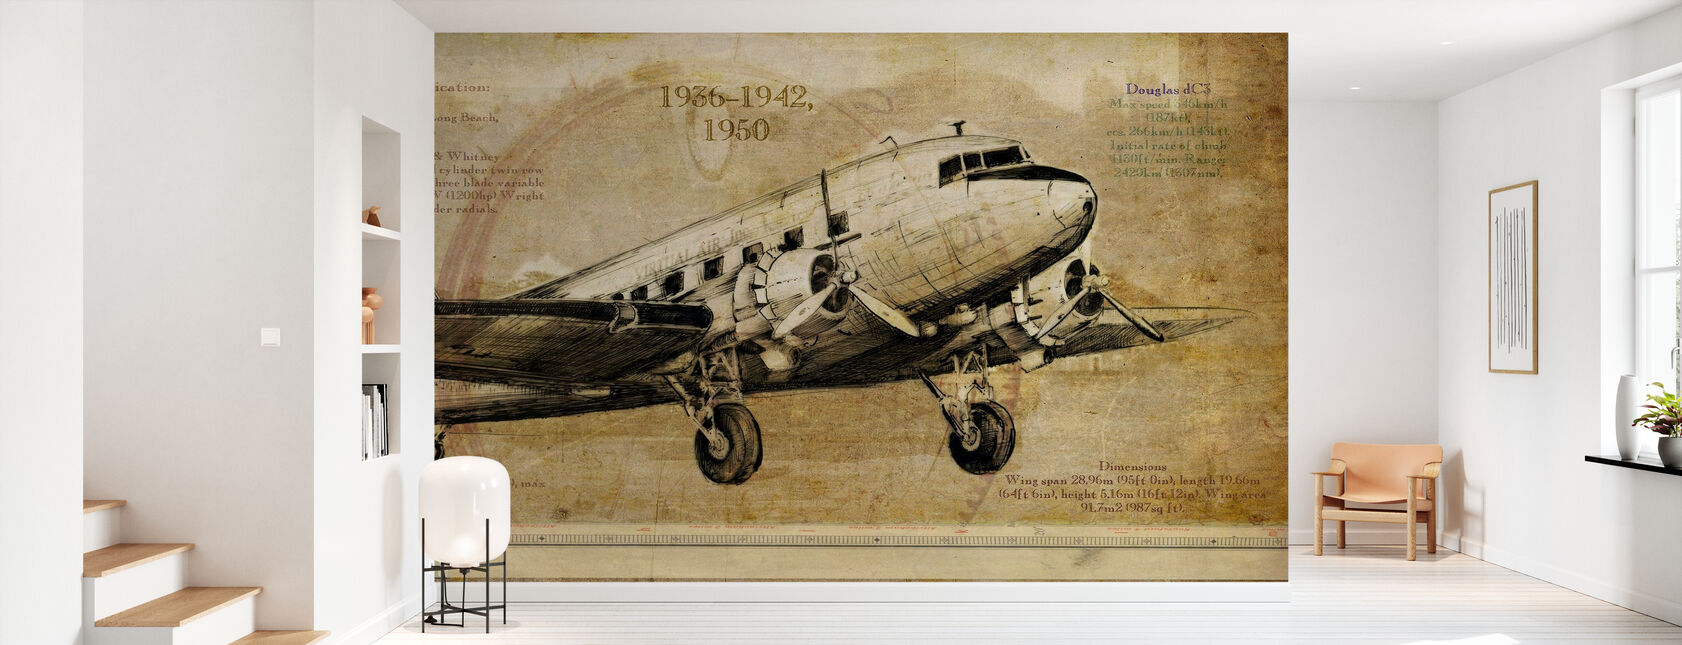 Lentokone - Tapetti - Aula